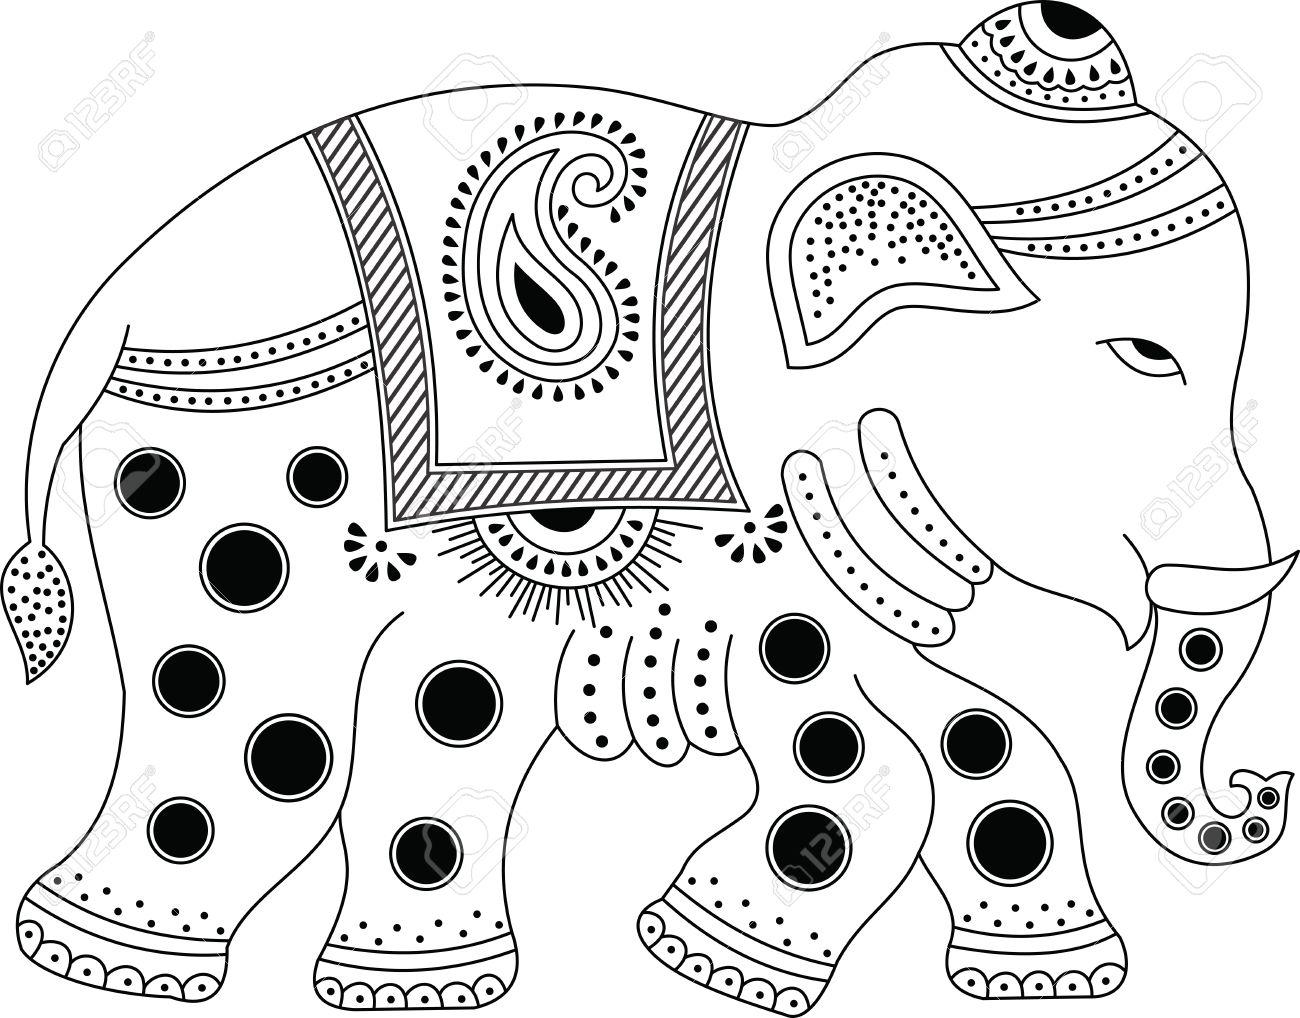 Wedding clipart elephant Elephant clipart Wedding collection Stock